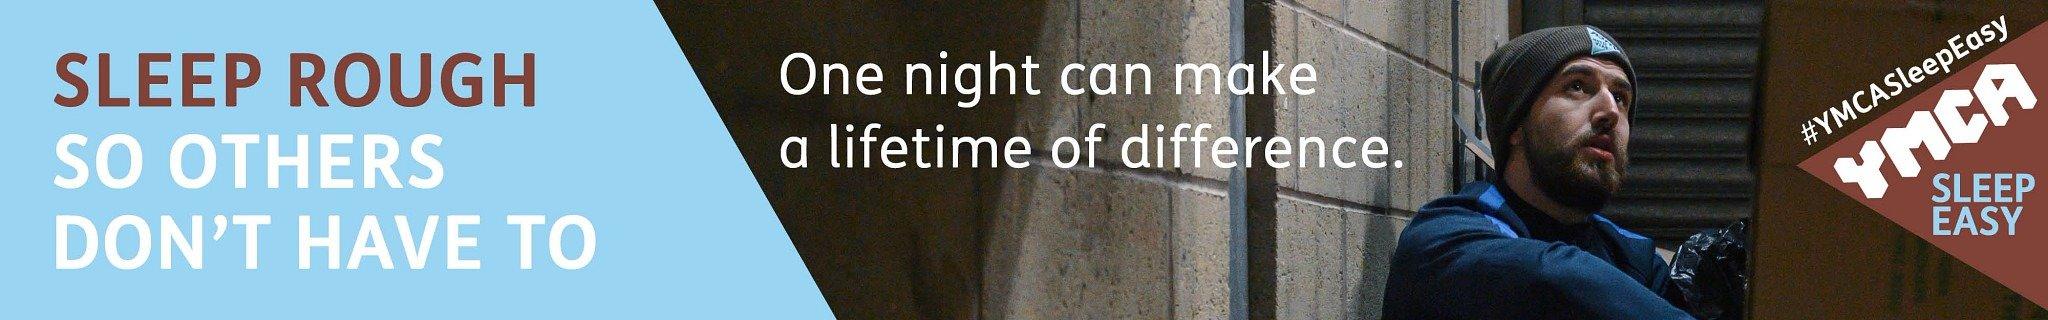 ymca sleep easy slim banner - World Sleep Day – 19th March 2021